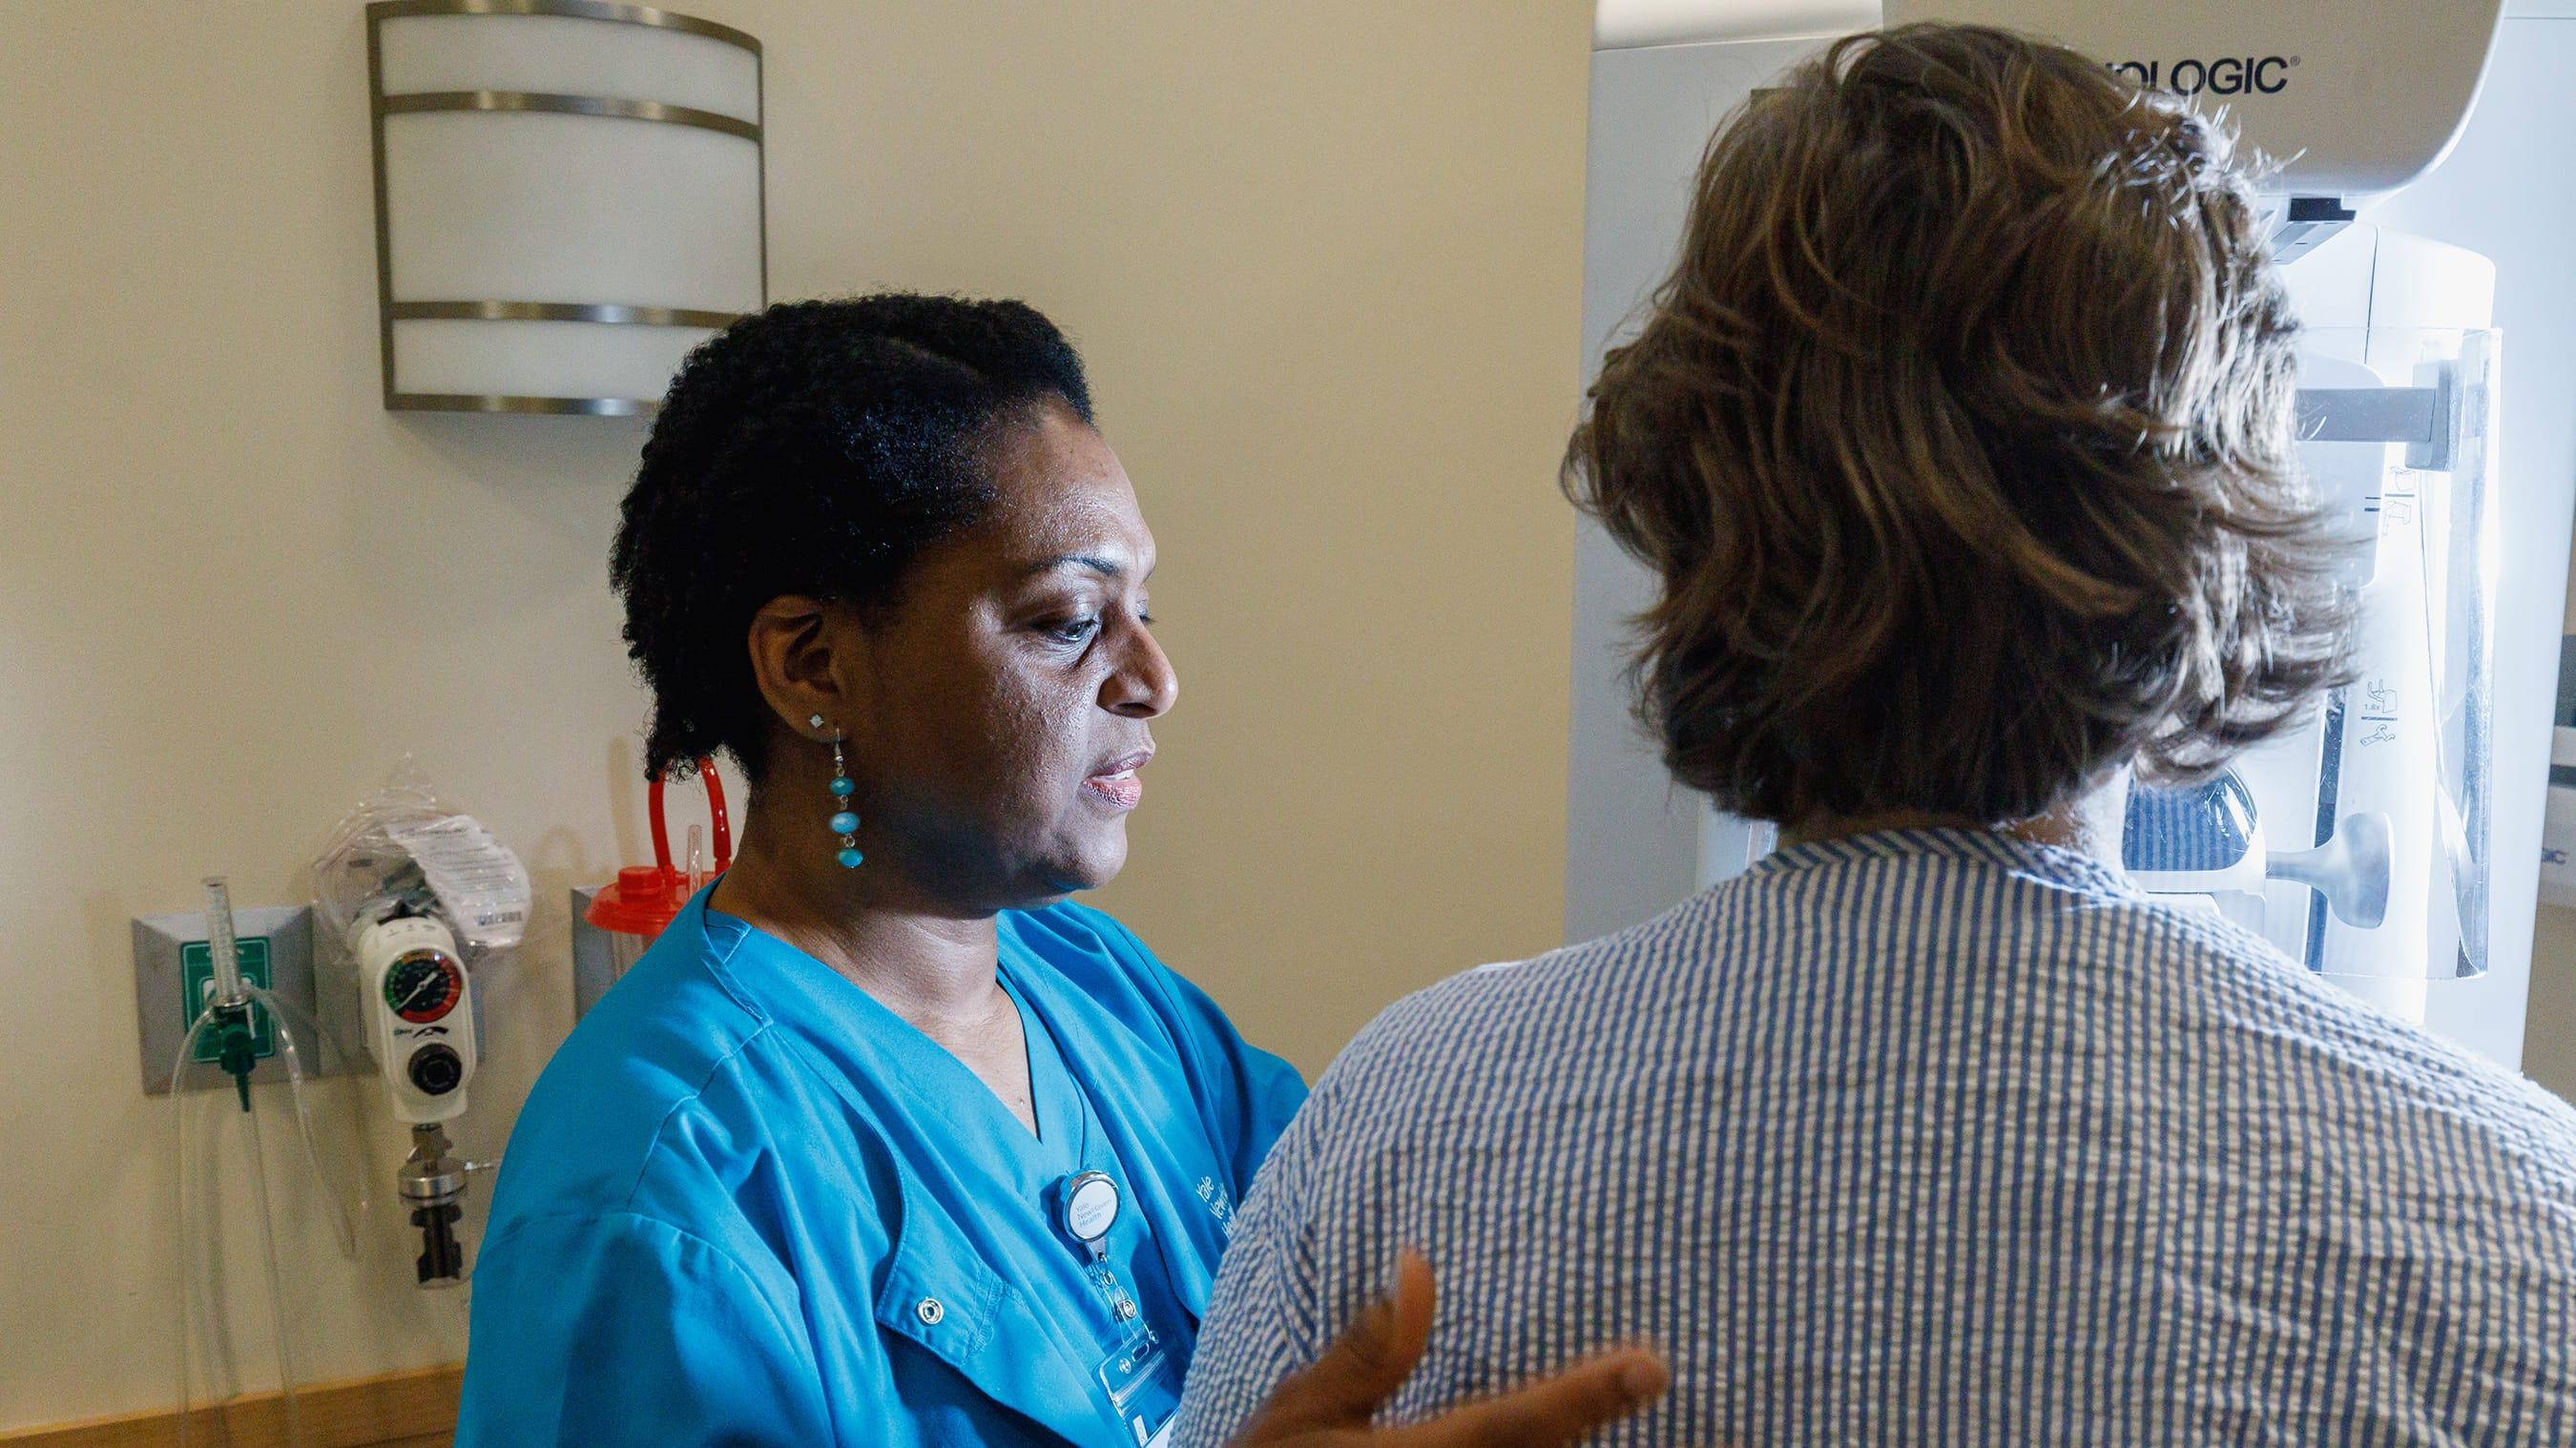 Mammography technician Rhona Hall prepares a fake patient for a 3D mammogram. 